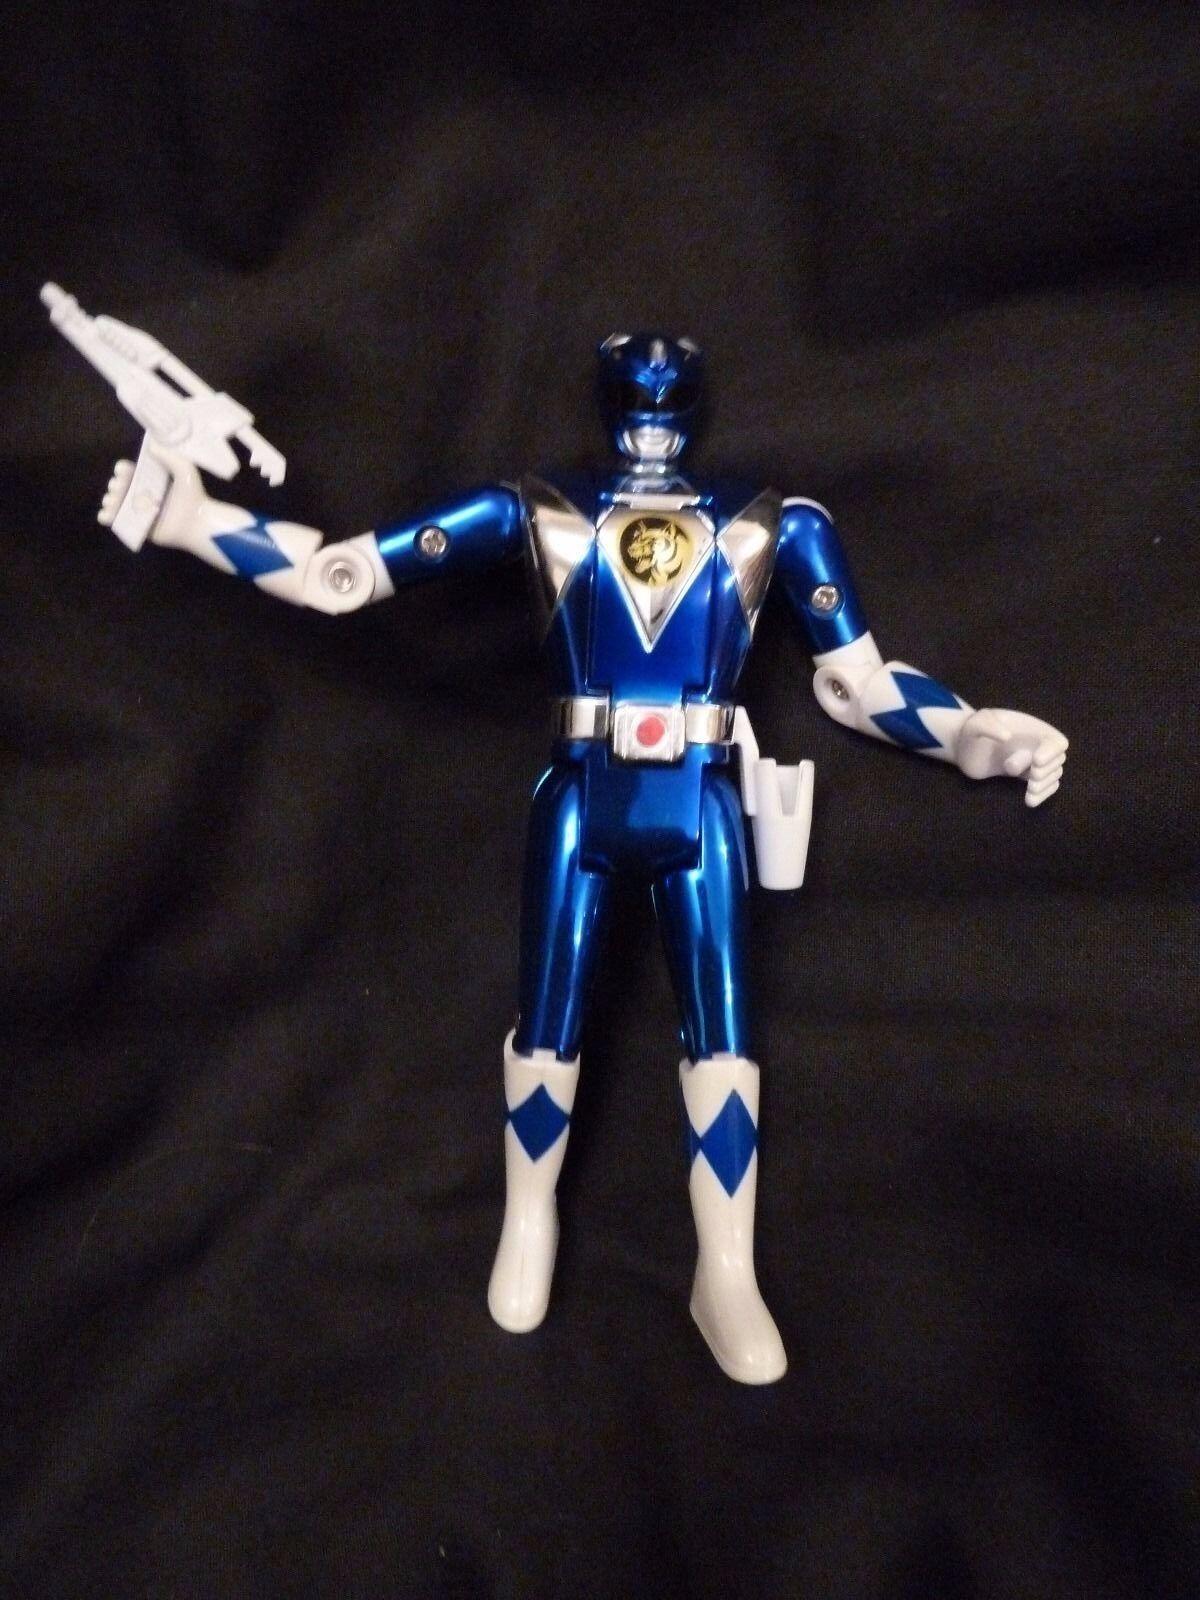 POWER RANGERS Chrome Flip Flip Chrome Head bluee Ranger Movie Limited Edition With Weopon c58385